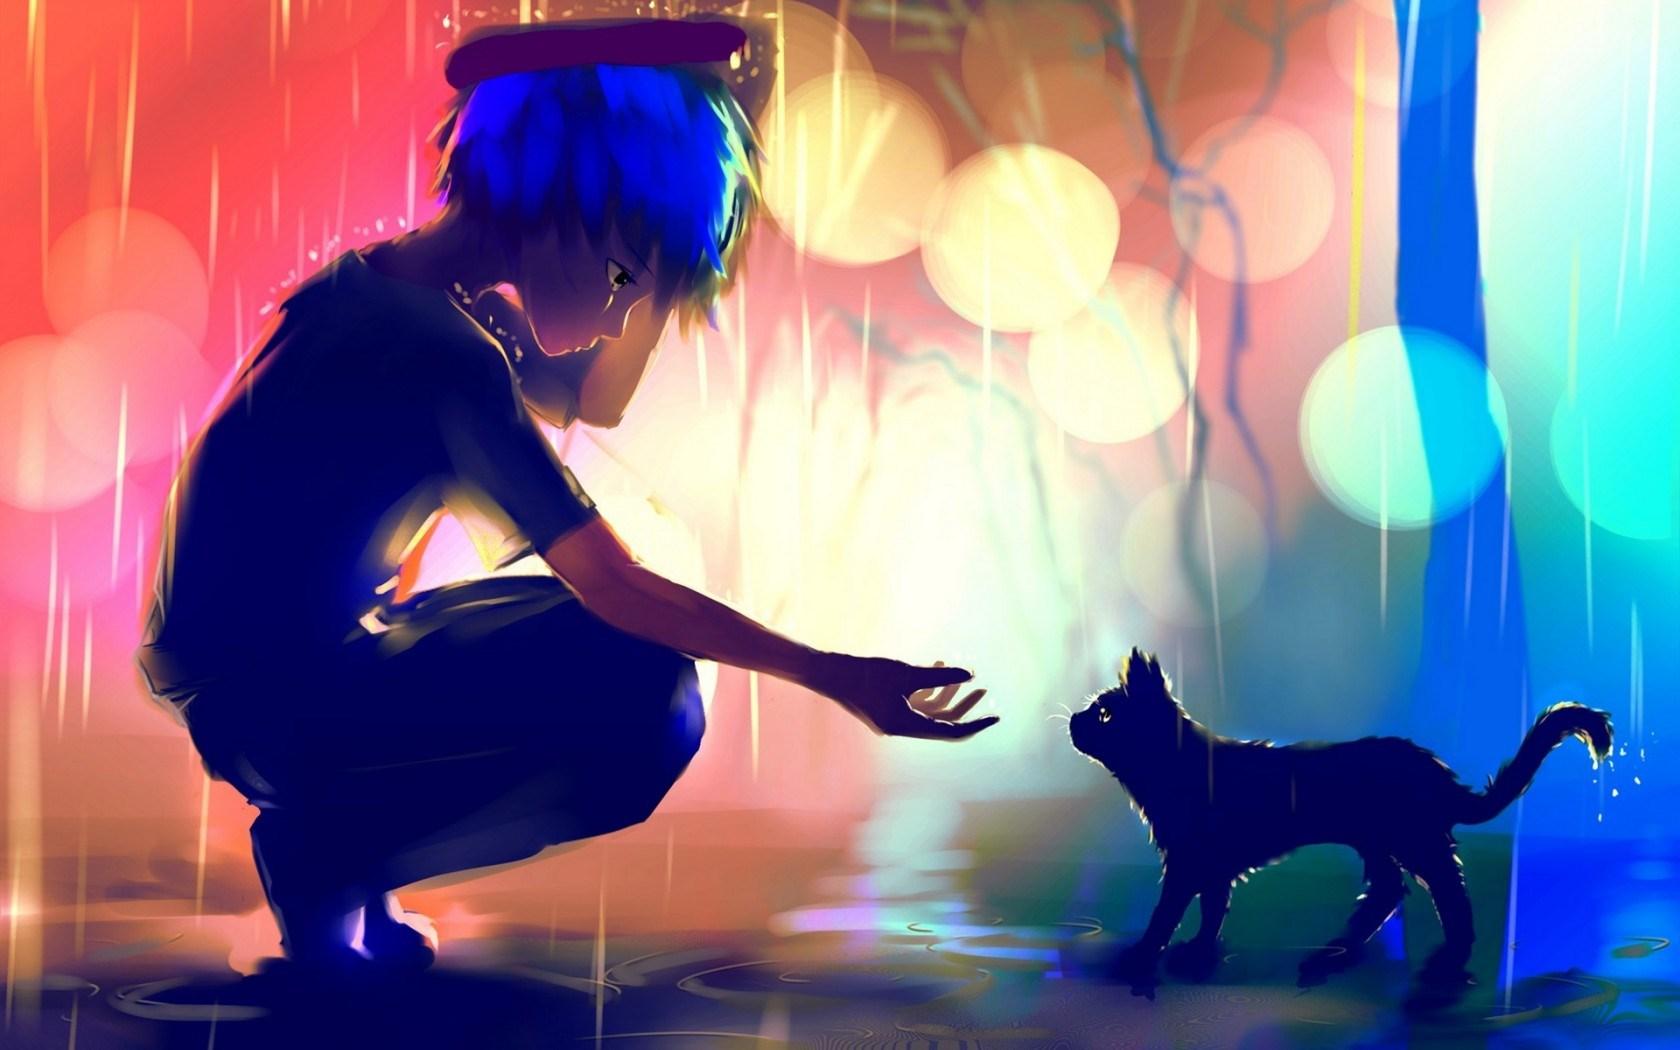 Free Download Manga Anime Wallpaper Drawing Art Boy Cat Rain Friend Bokeh 1680x1050 For Your Desktop Mobile Tablet Explore 74 Anime Boy Wallpaper Anime Guy Wallpaper Hd Boys Wallpapers